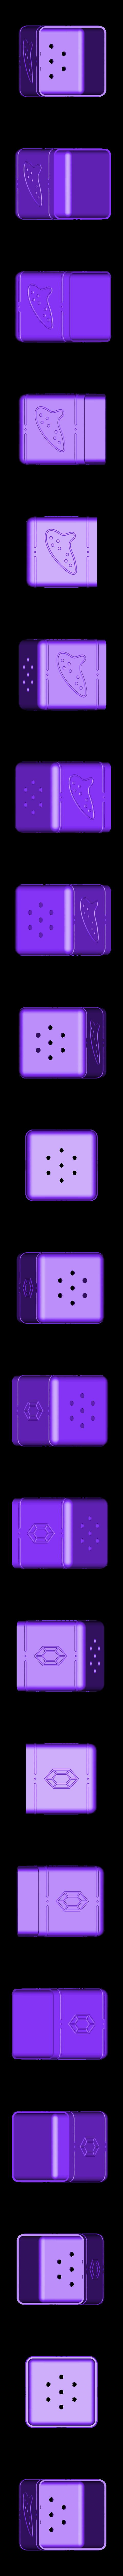 planter_zelda_single_holes.stl Download free STL file Video Game Planter Collection • Object to 3D print, flowalistik